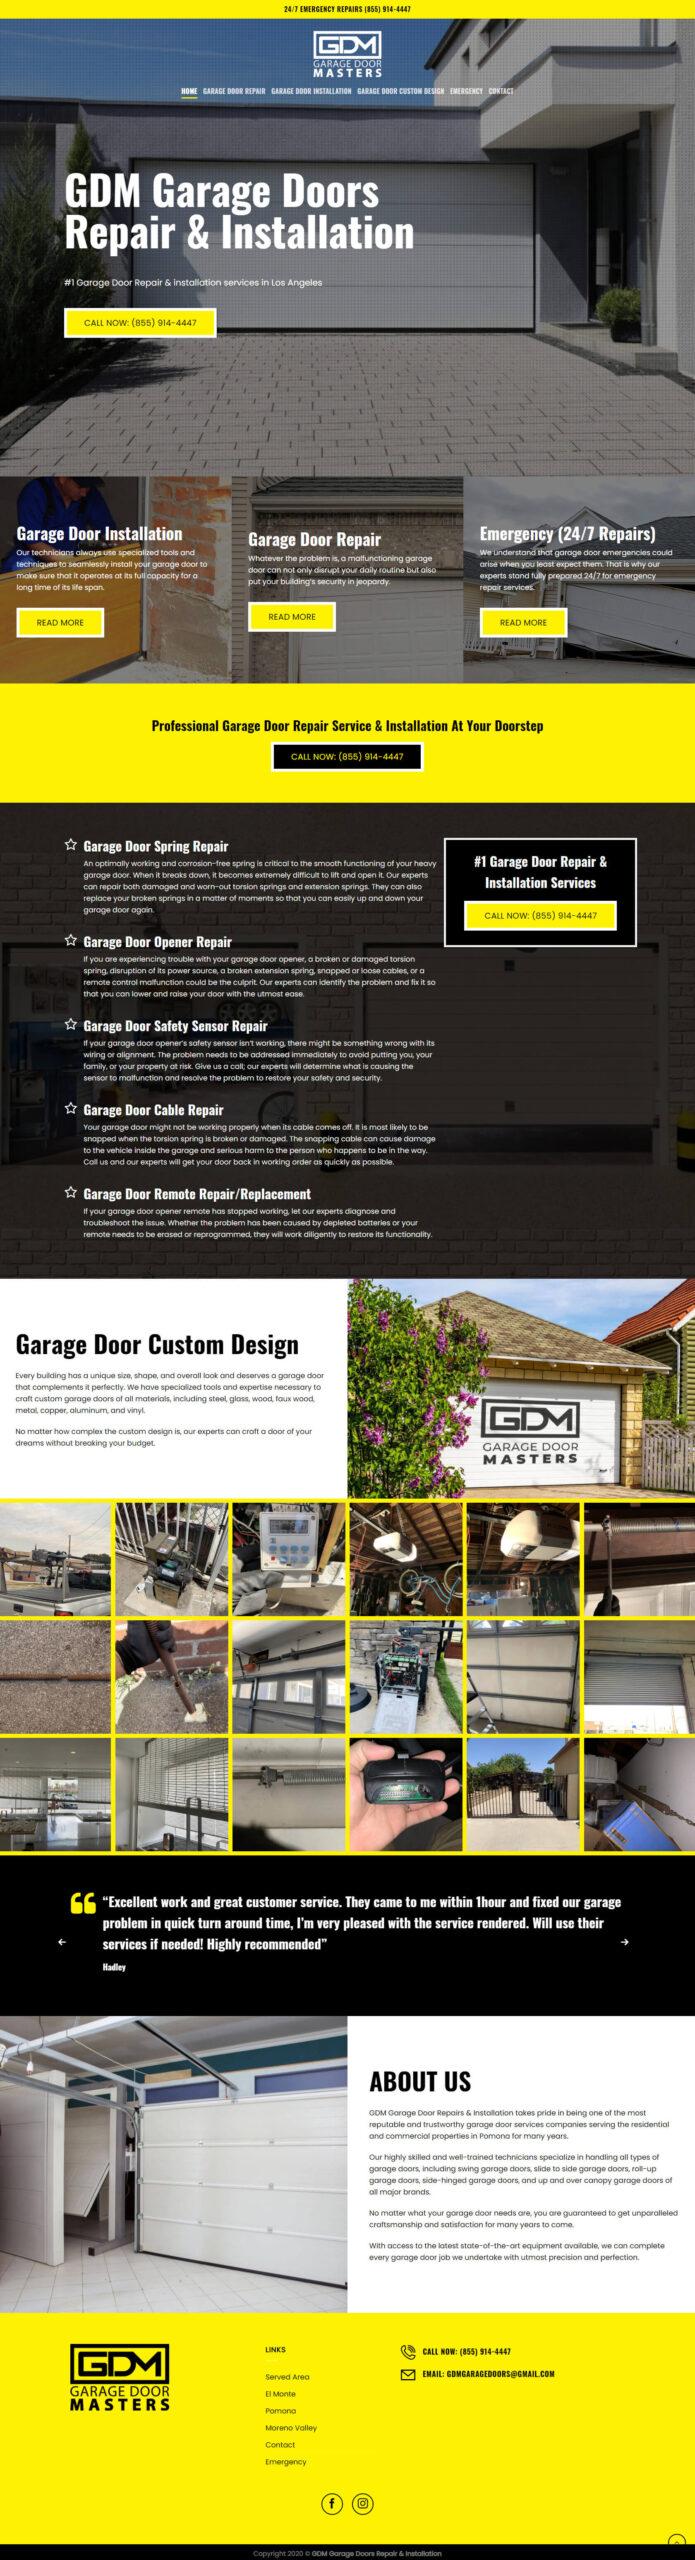 GDM Garage Doors Repair & Installation